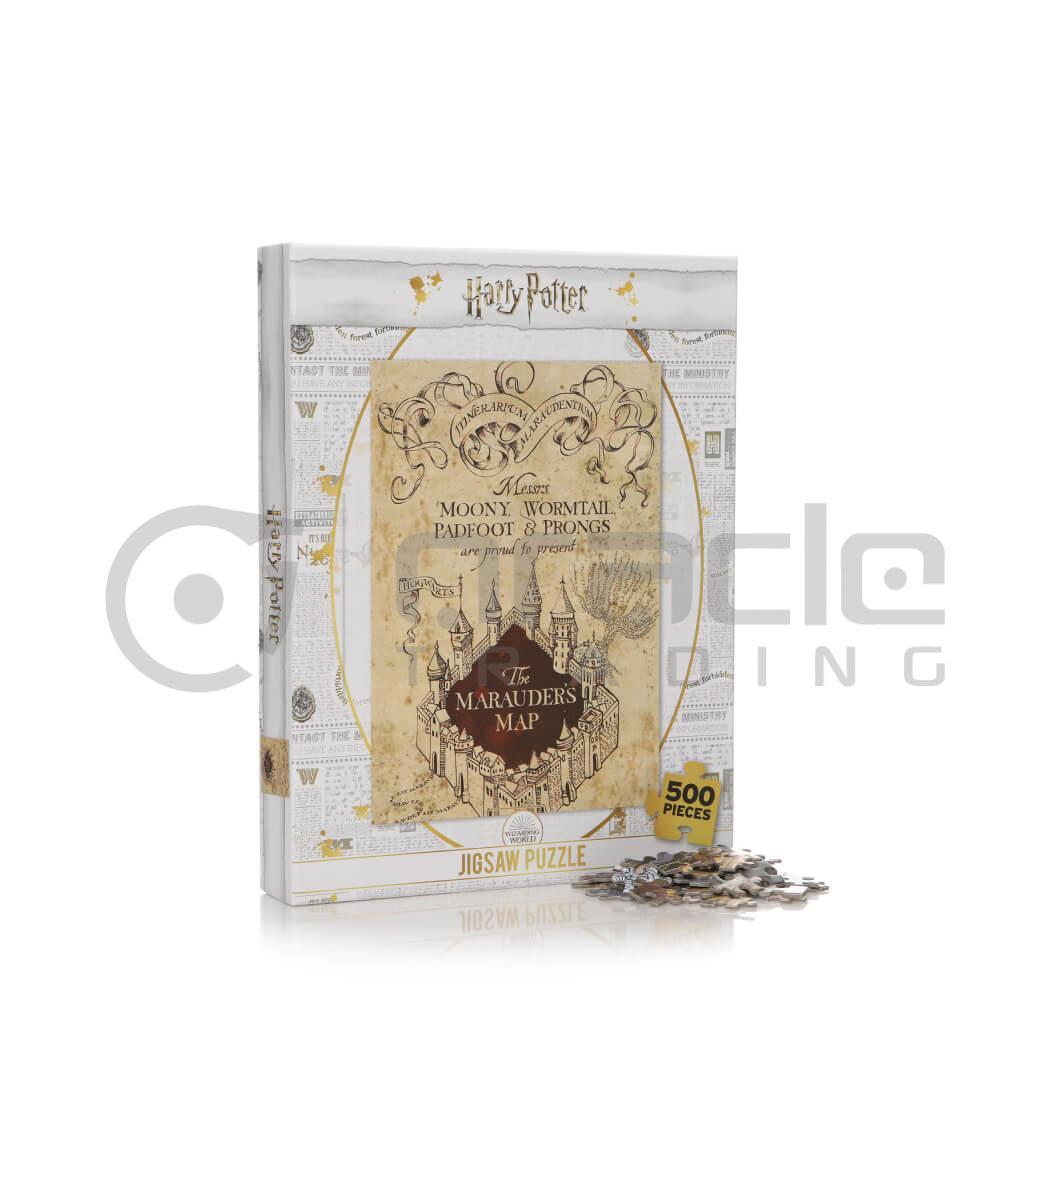 Harry Potter Jigsaw Puzzle - Marauders Map